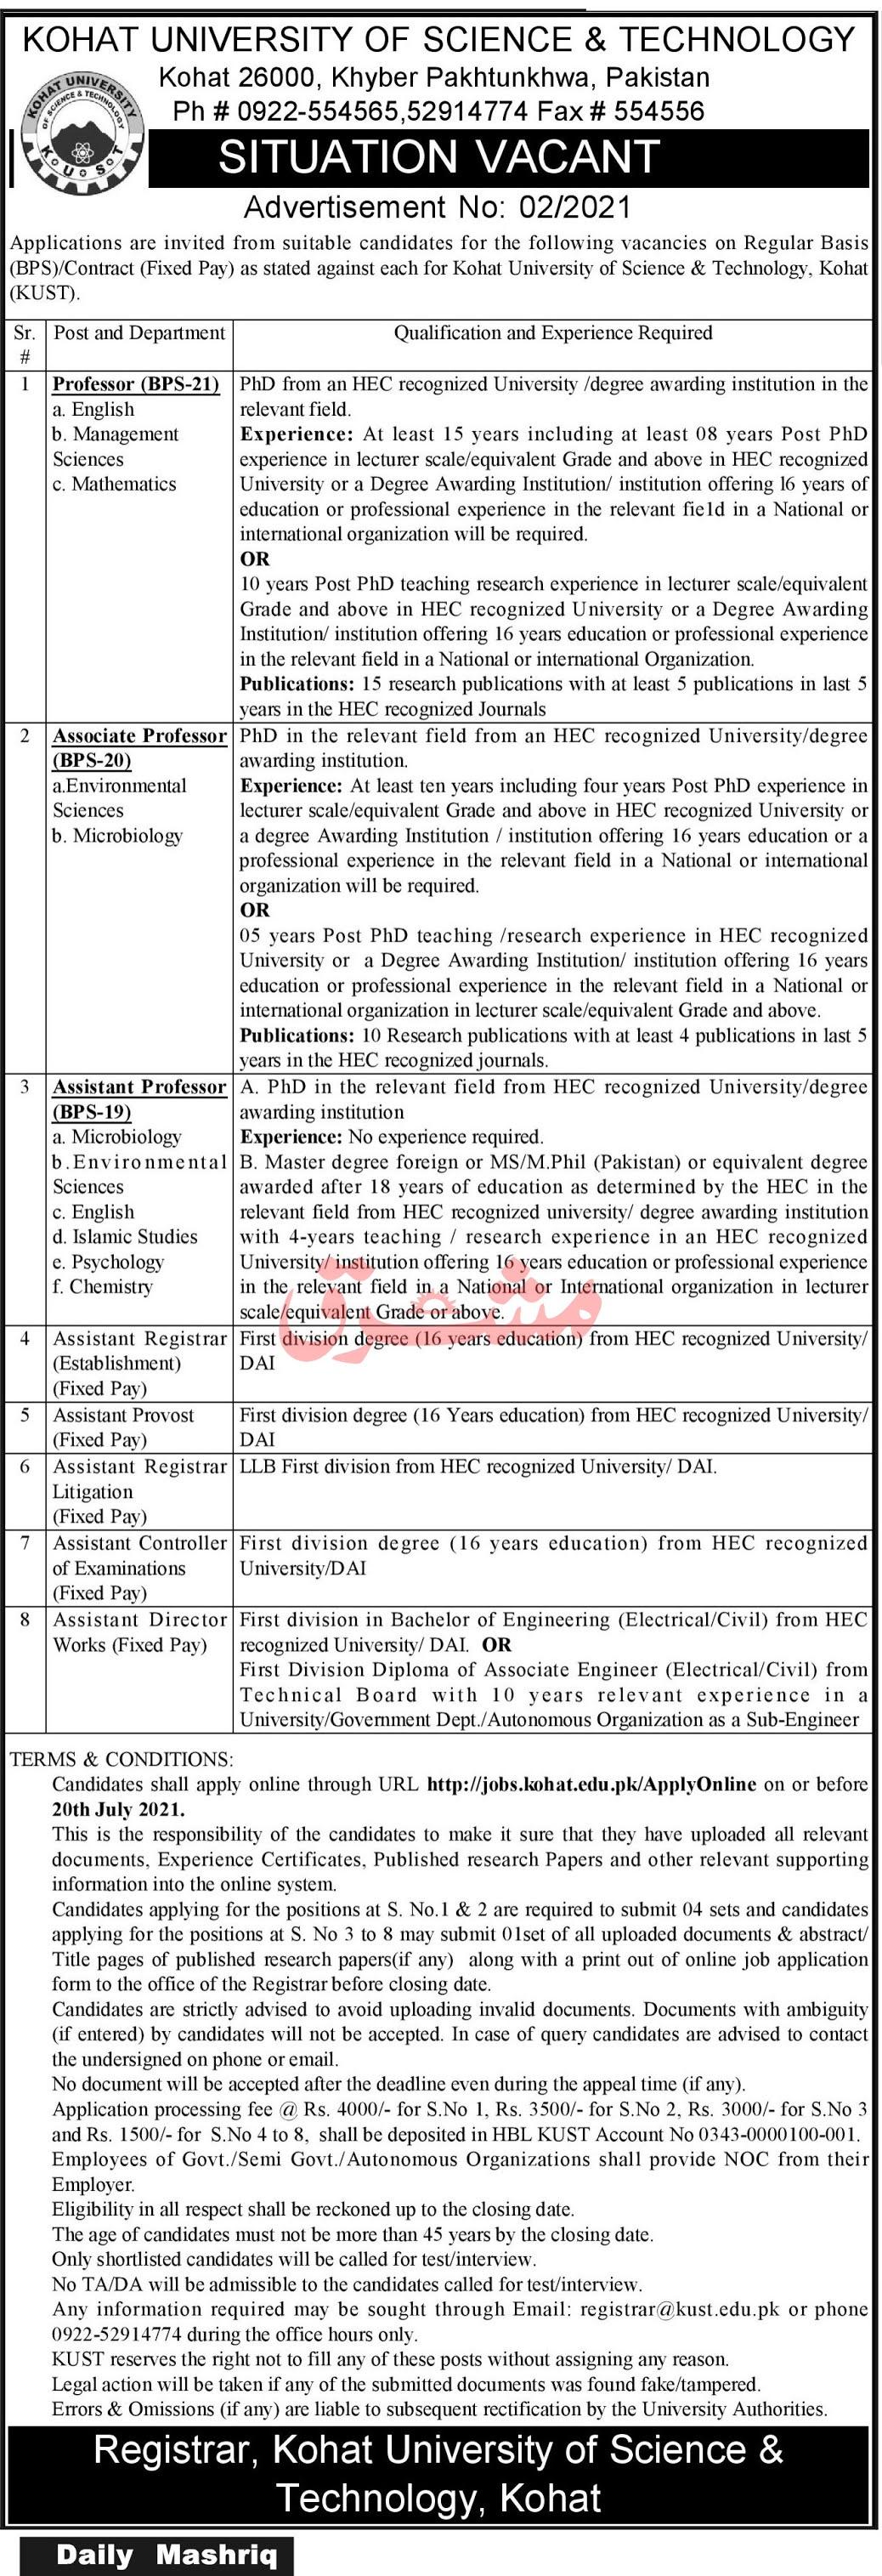 http://jobs.kohat.edu.pk Jobs 2021 - Kohat University Of Science & Technology 2021 in Pakistan